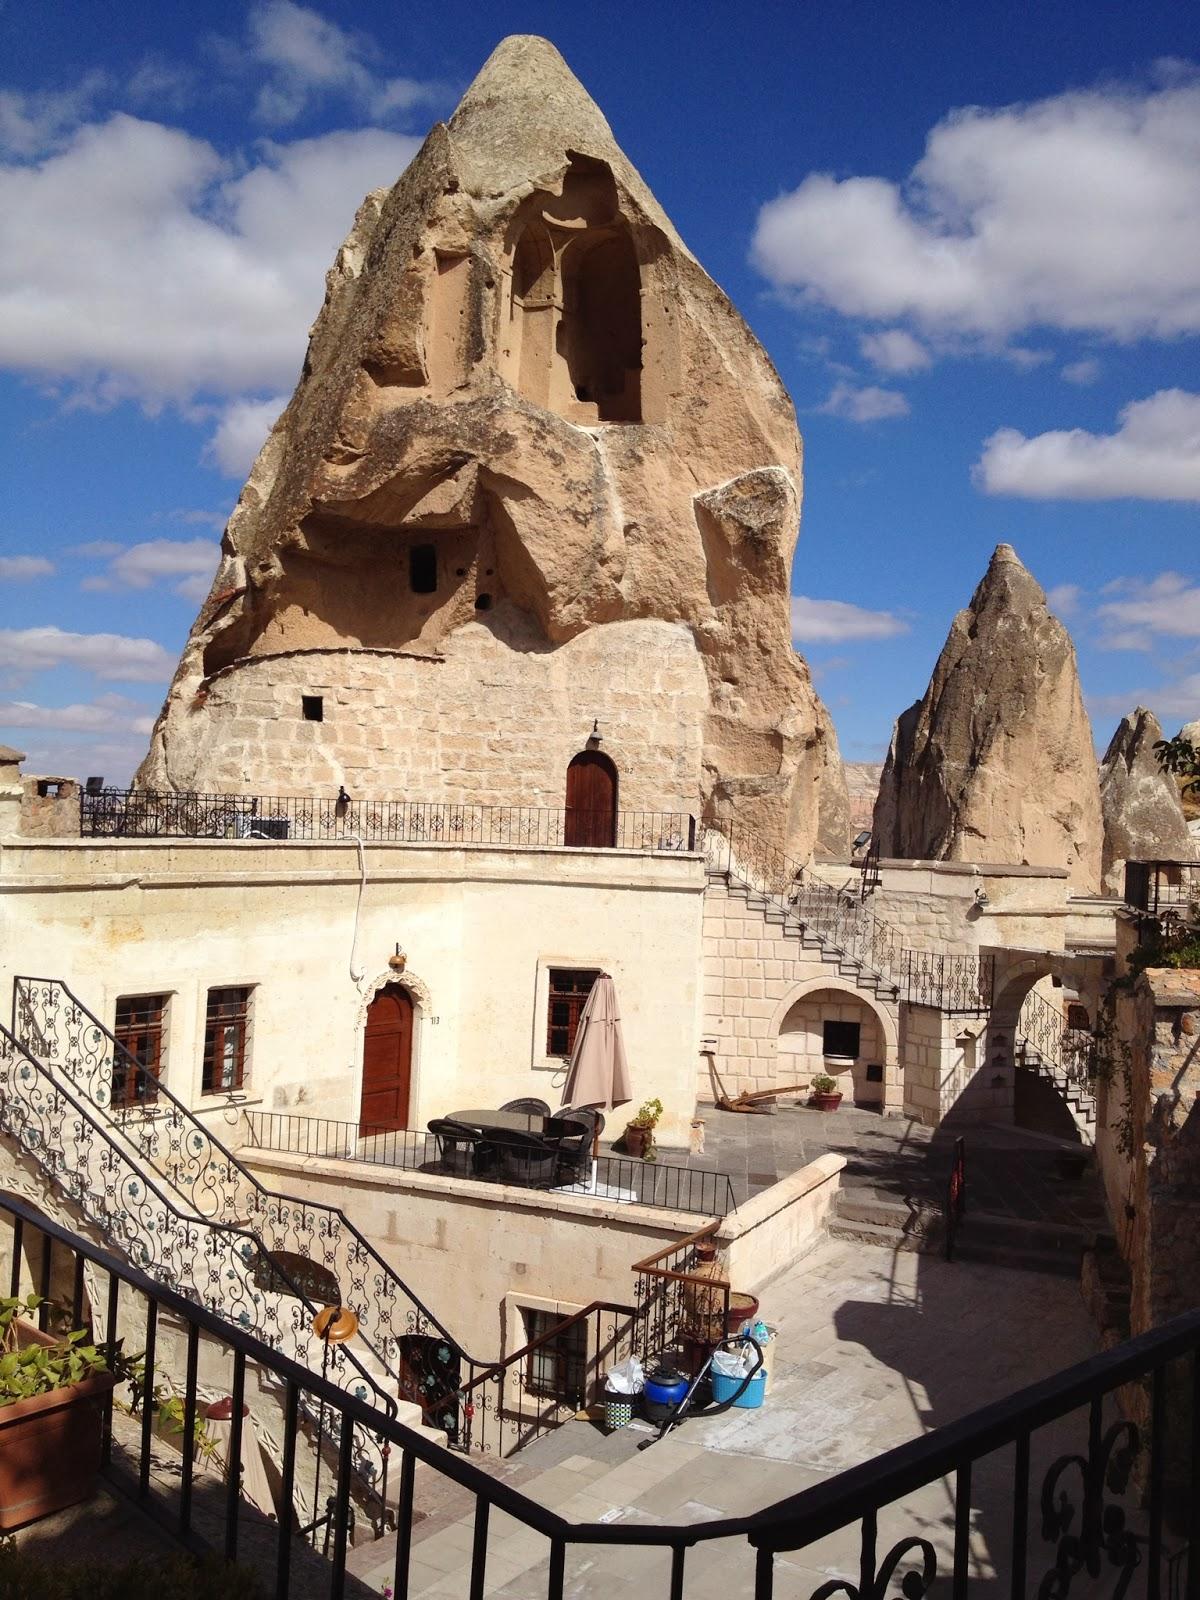 Cappadocia - The grounds of Cappadocia Cave Suites